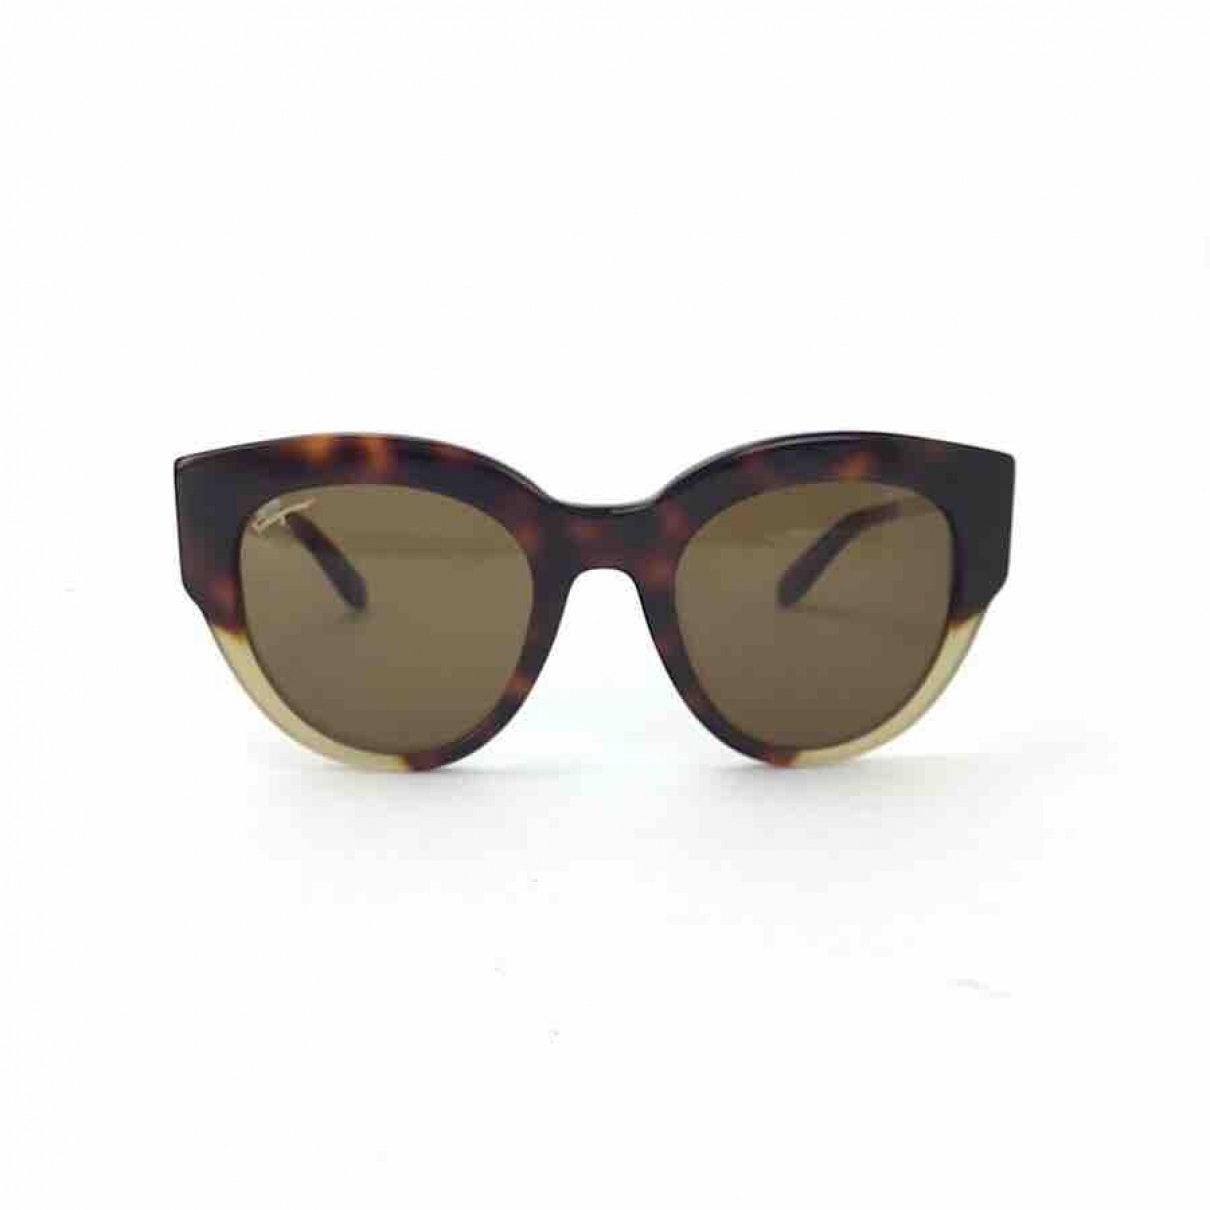 Ferragamo n Other Plastic Sunglasses